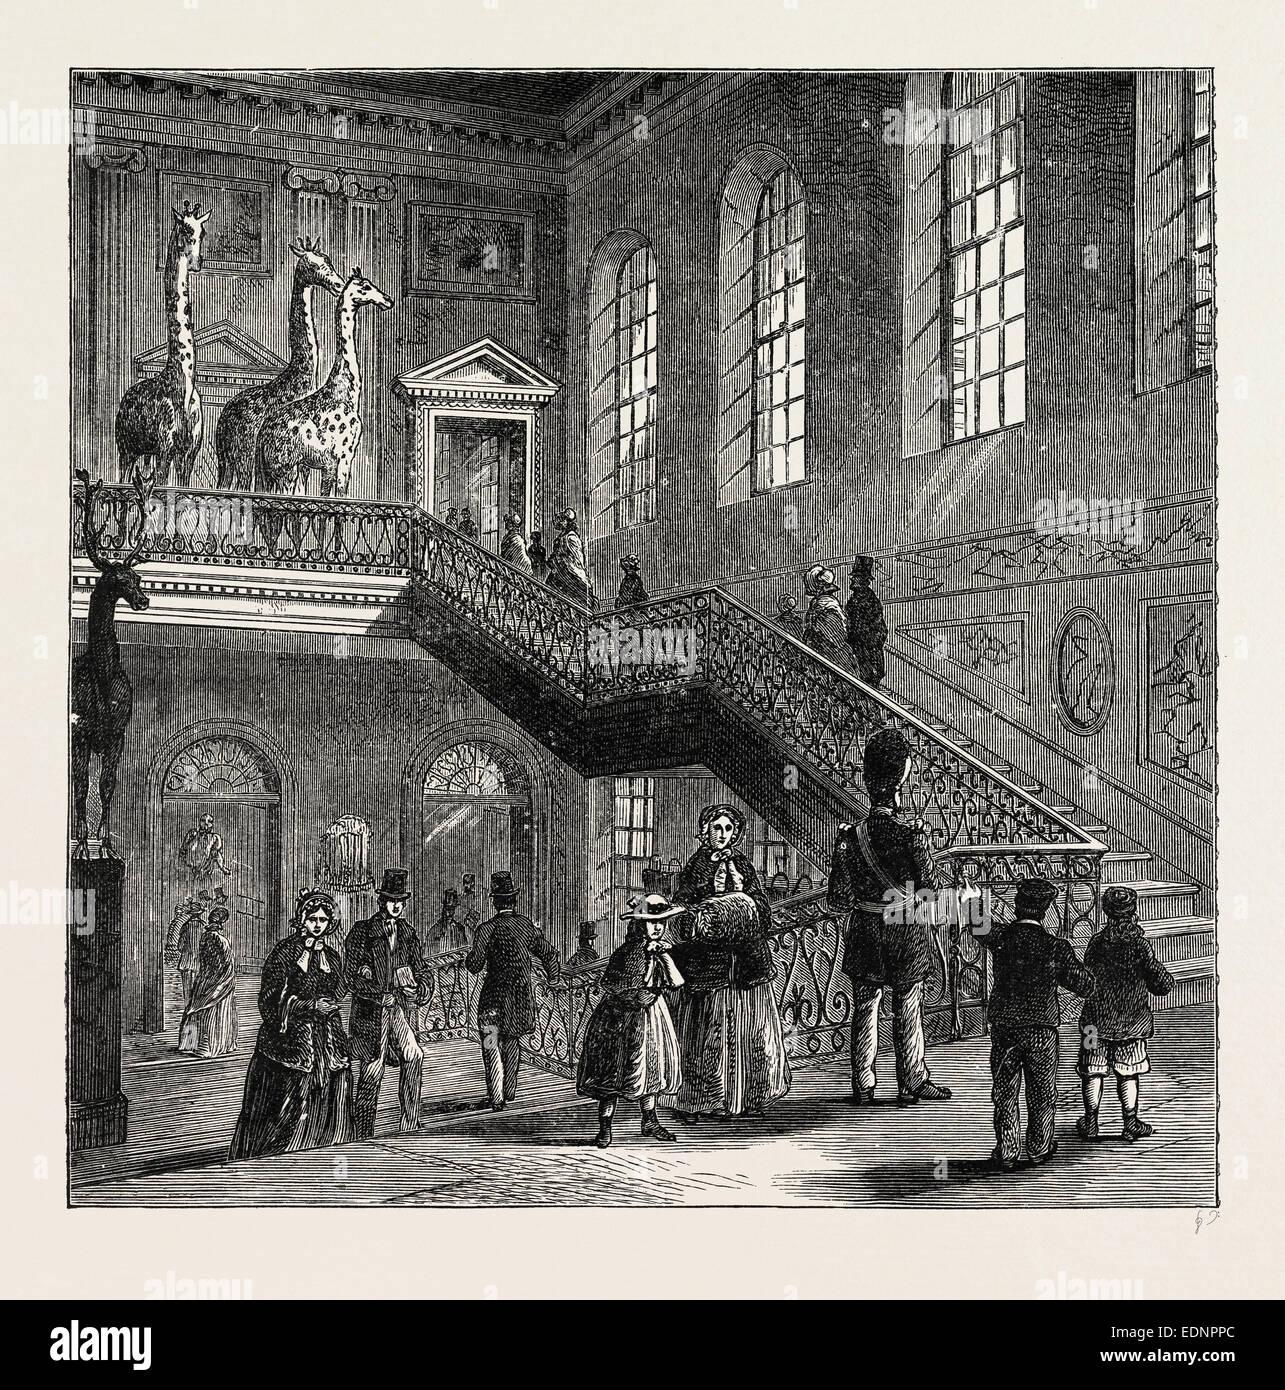 MONTAGU HOUSE, GRAND STAIRCASE, 1830. London, UK, 19th century engraving - Stock Image